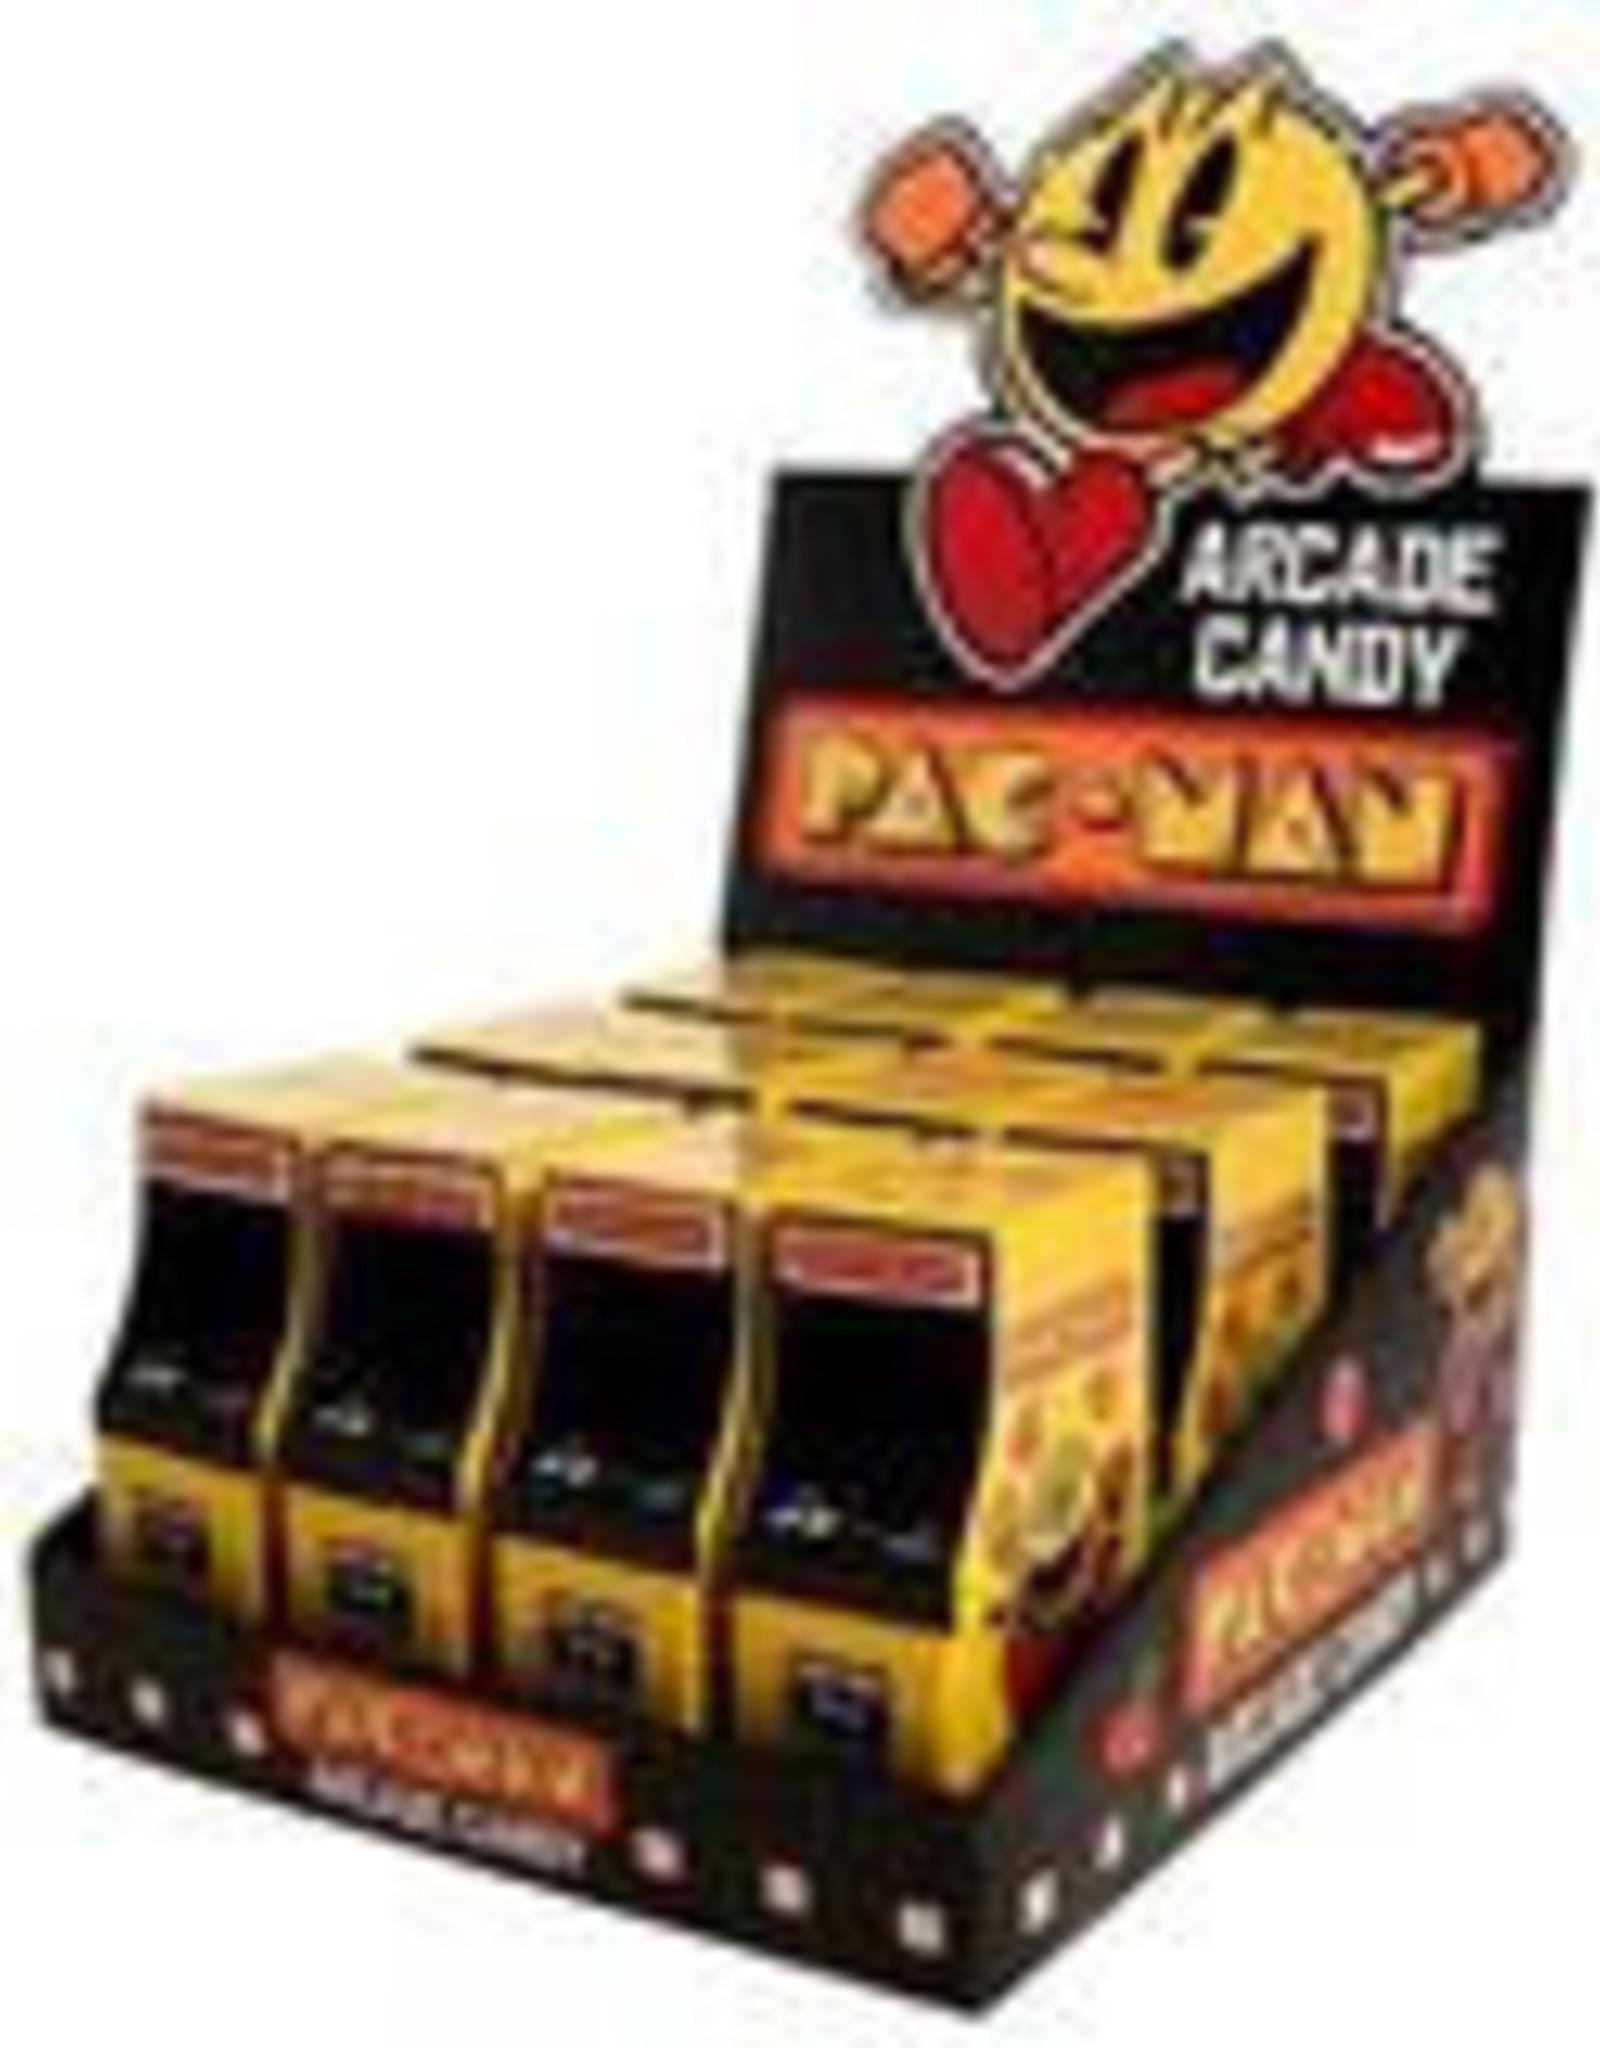 Boston America Pac-Man Arcade Candy